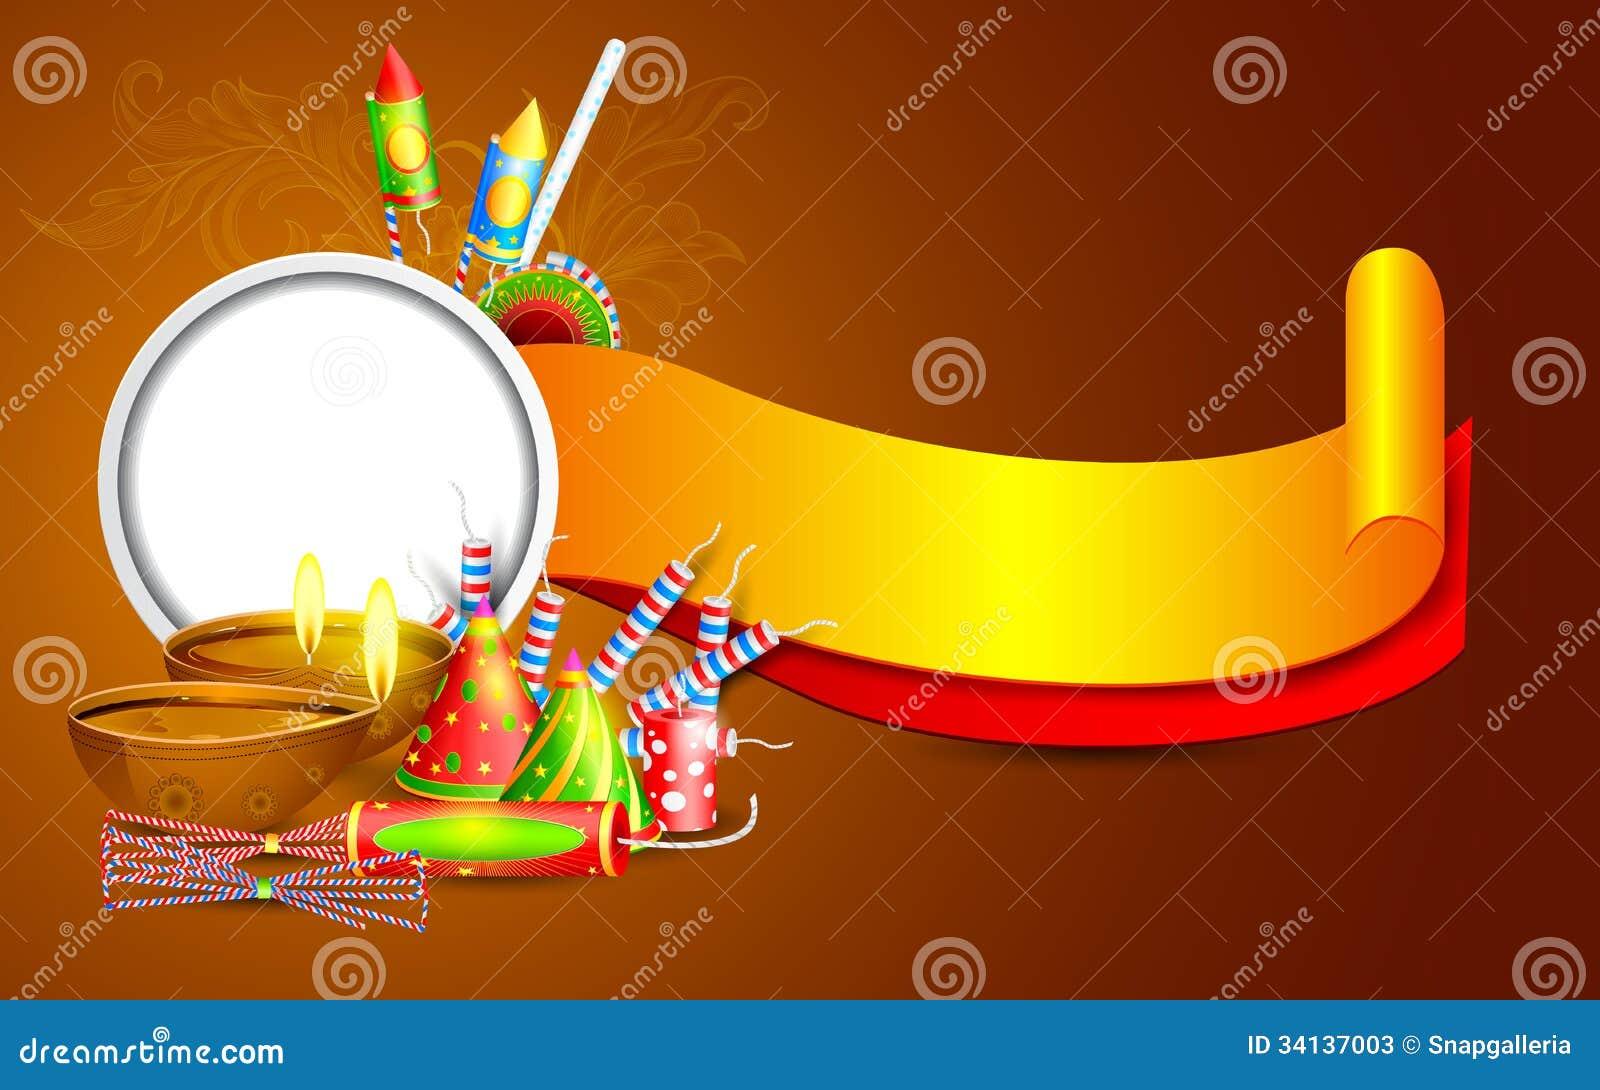 Diwali banner stock photos image 34137003 Online vector editor